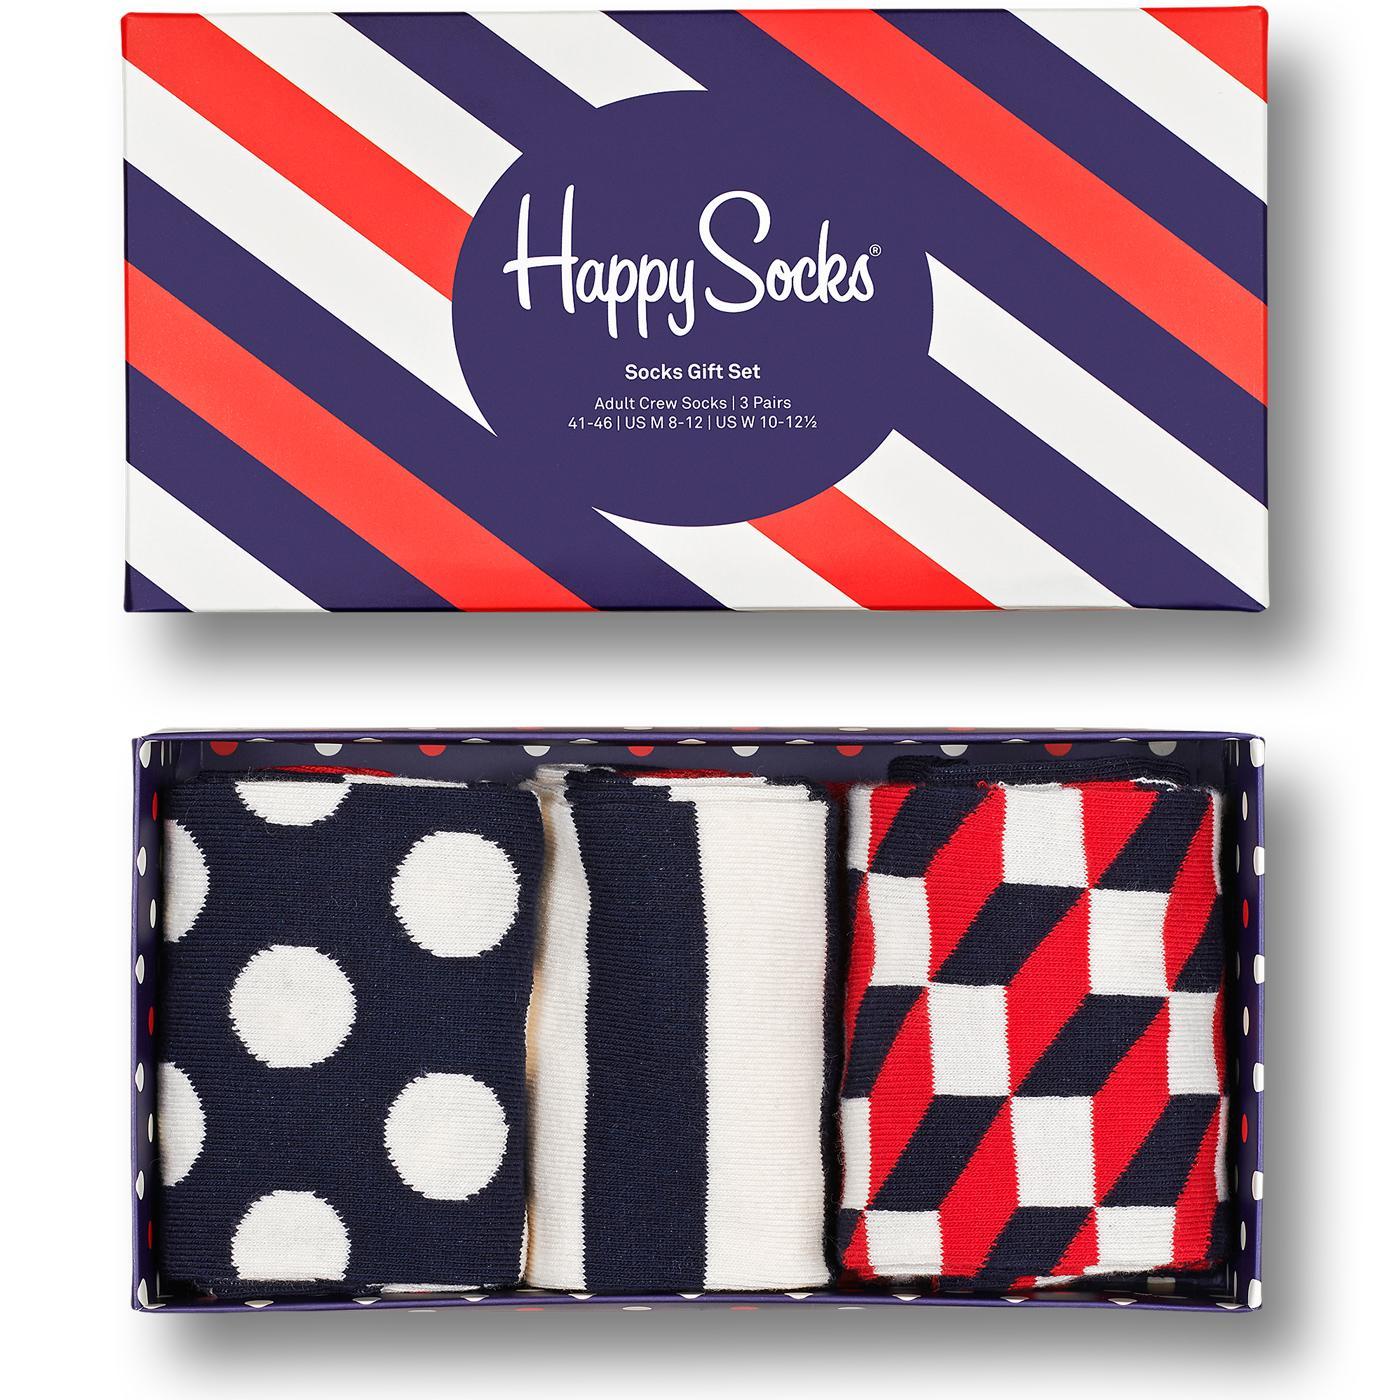 +HAPPY SOCKS Big Dot & Stripe 3 Pack Sock Gift Set